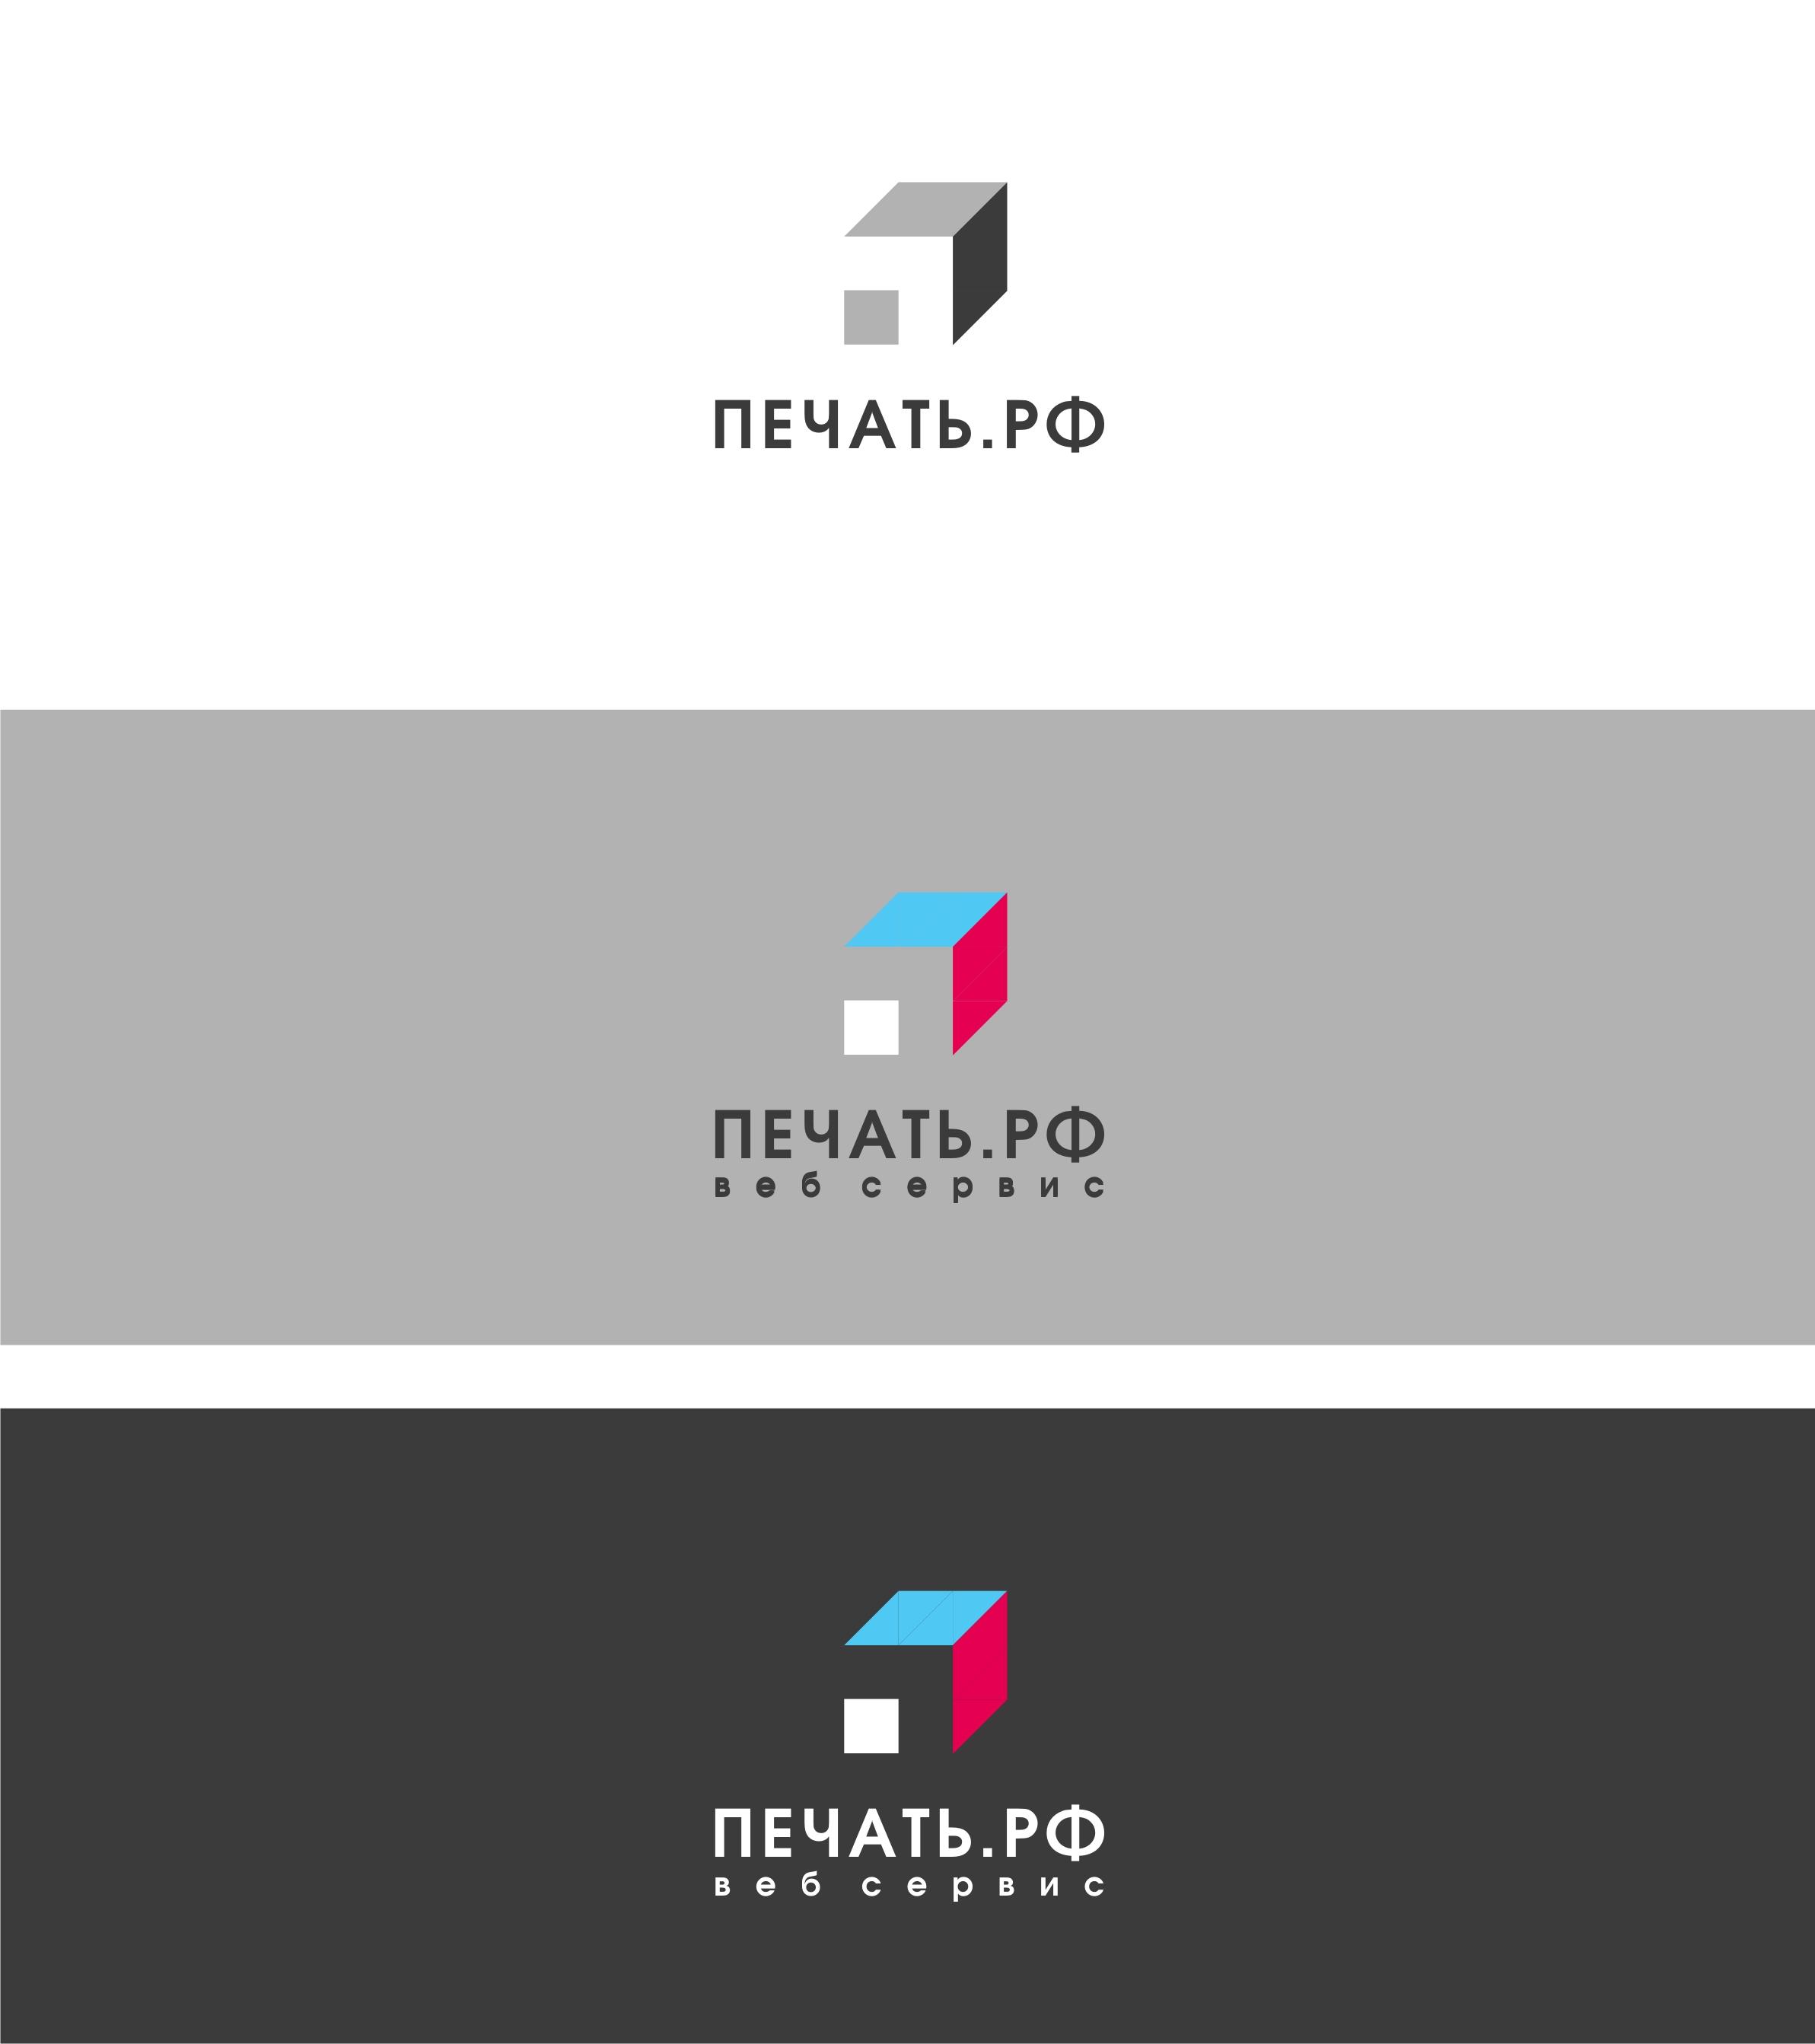 Логотип для веб-сервиса интерьерной печати и оперативной пол фото f_5145d2c6b93c99f7.jpg